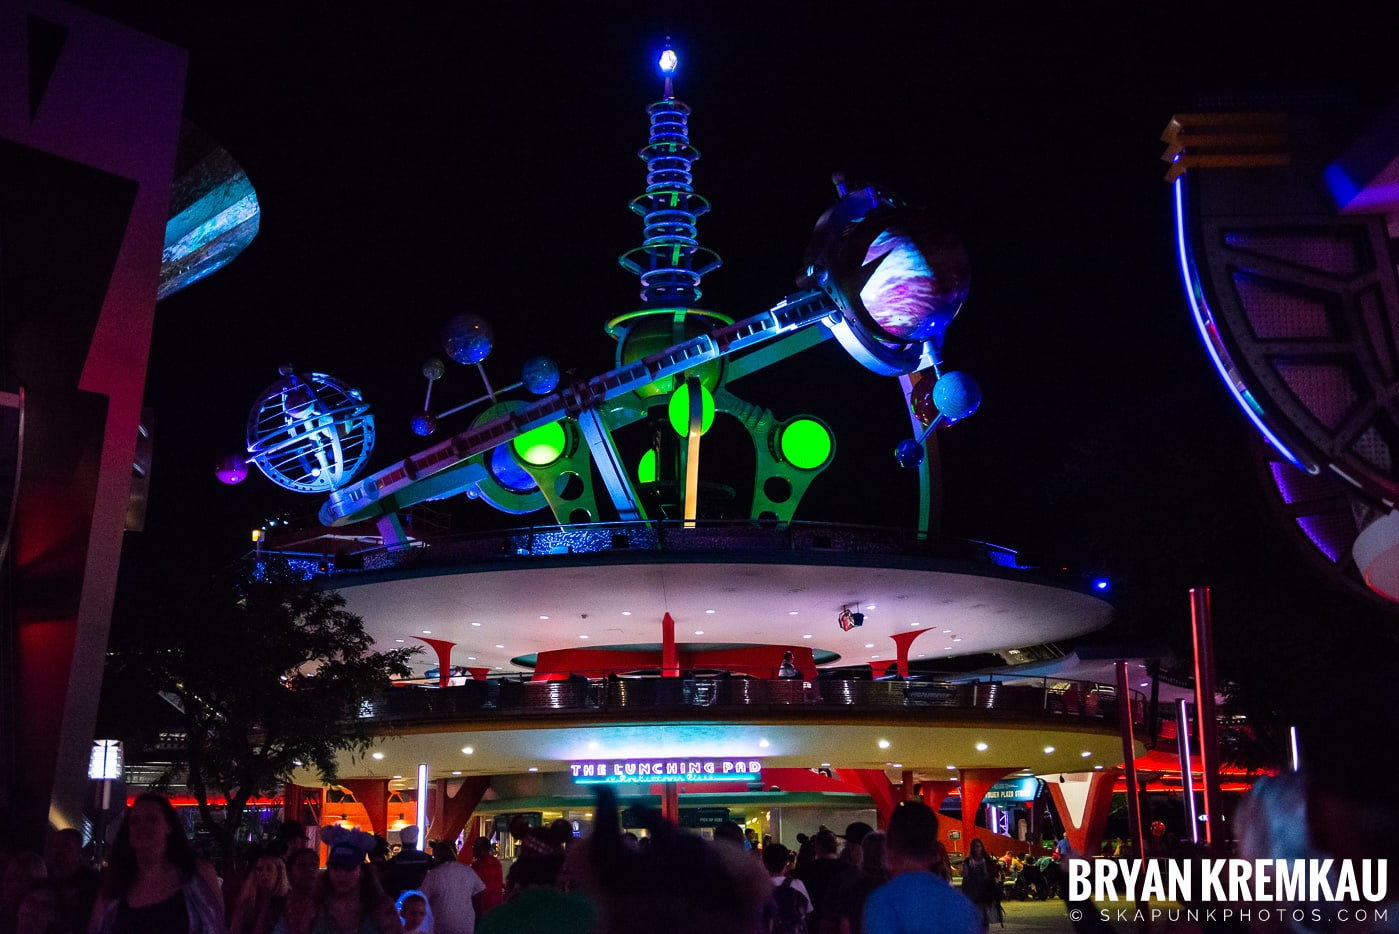 Walt Disney World Vacation: Day 3 (Disney's Hollywood Studios / Magic Kingdom) October 1st 2019 (7)